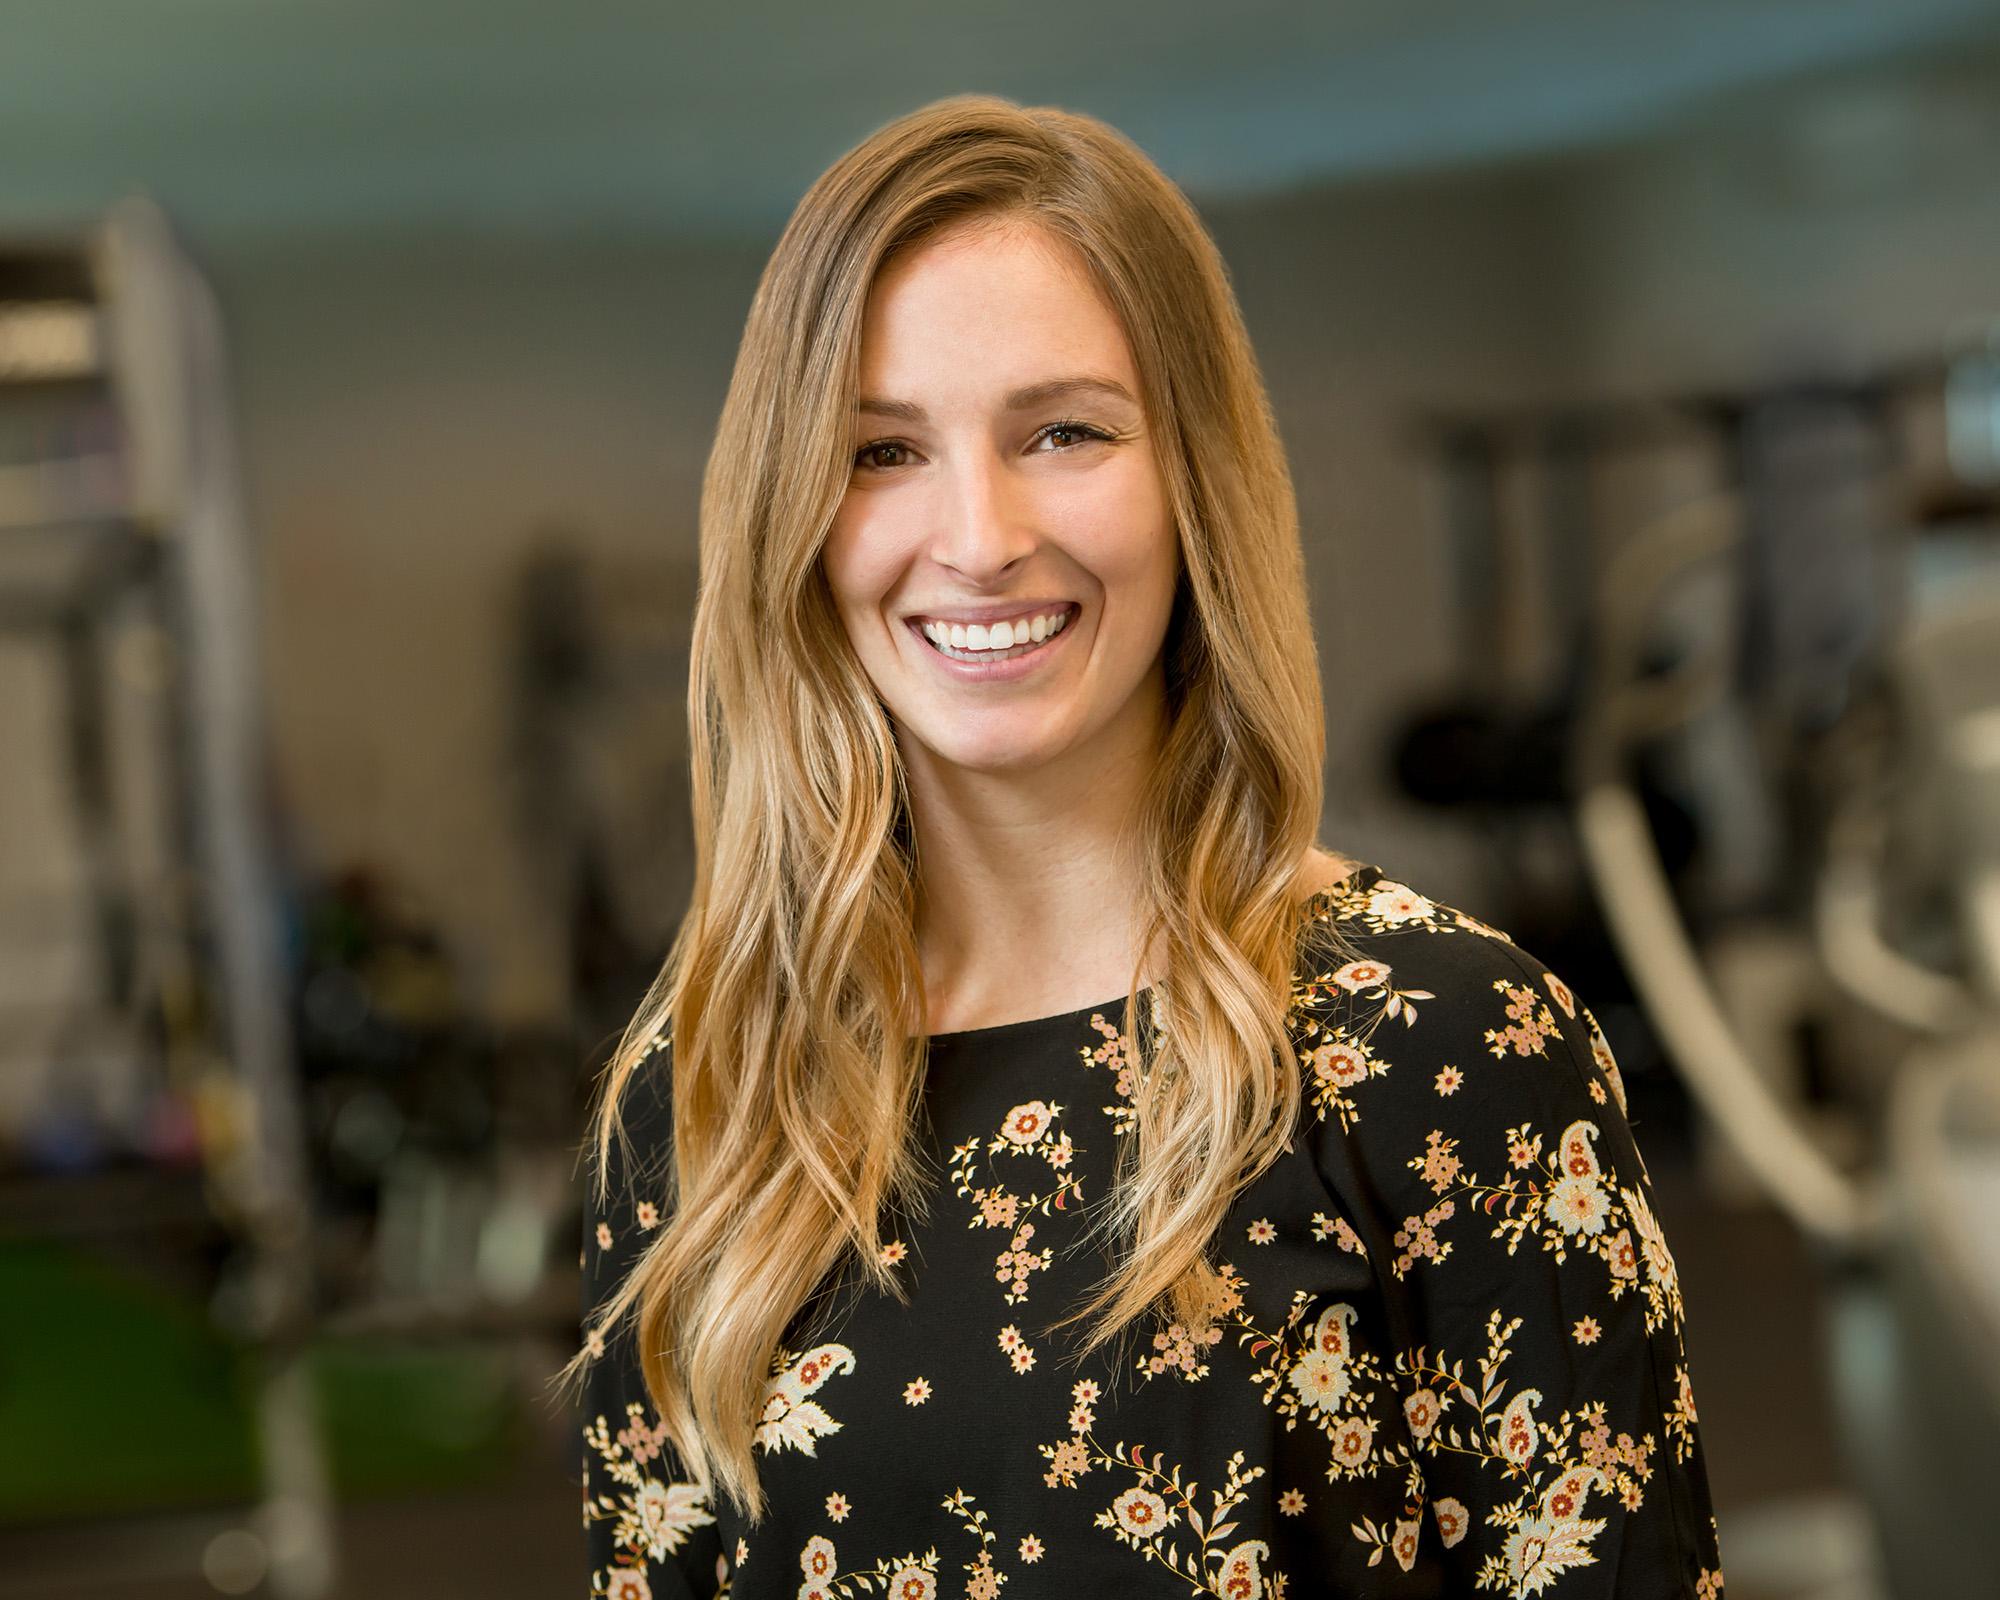 Megan Hotchkiss - PT, DPT